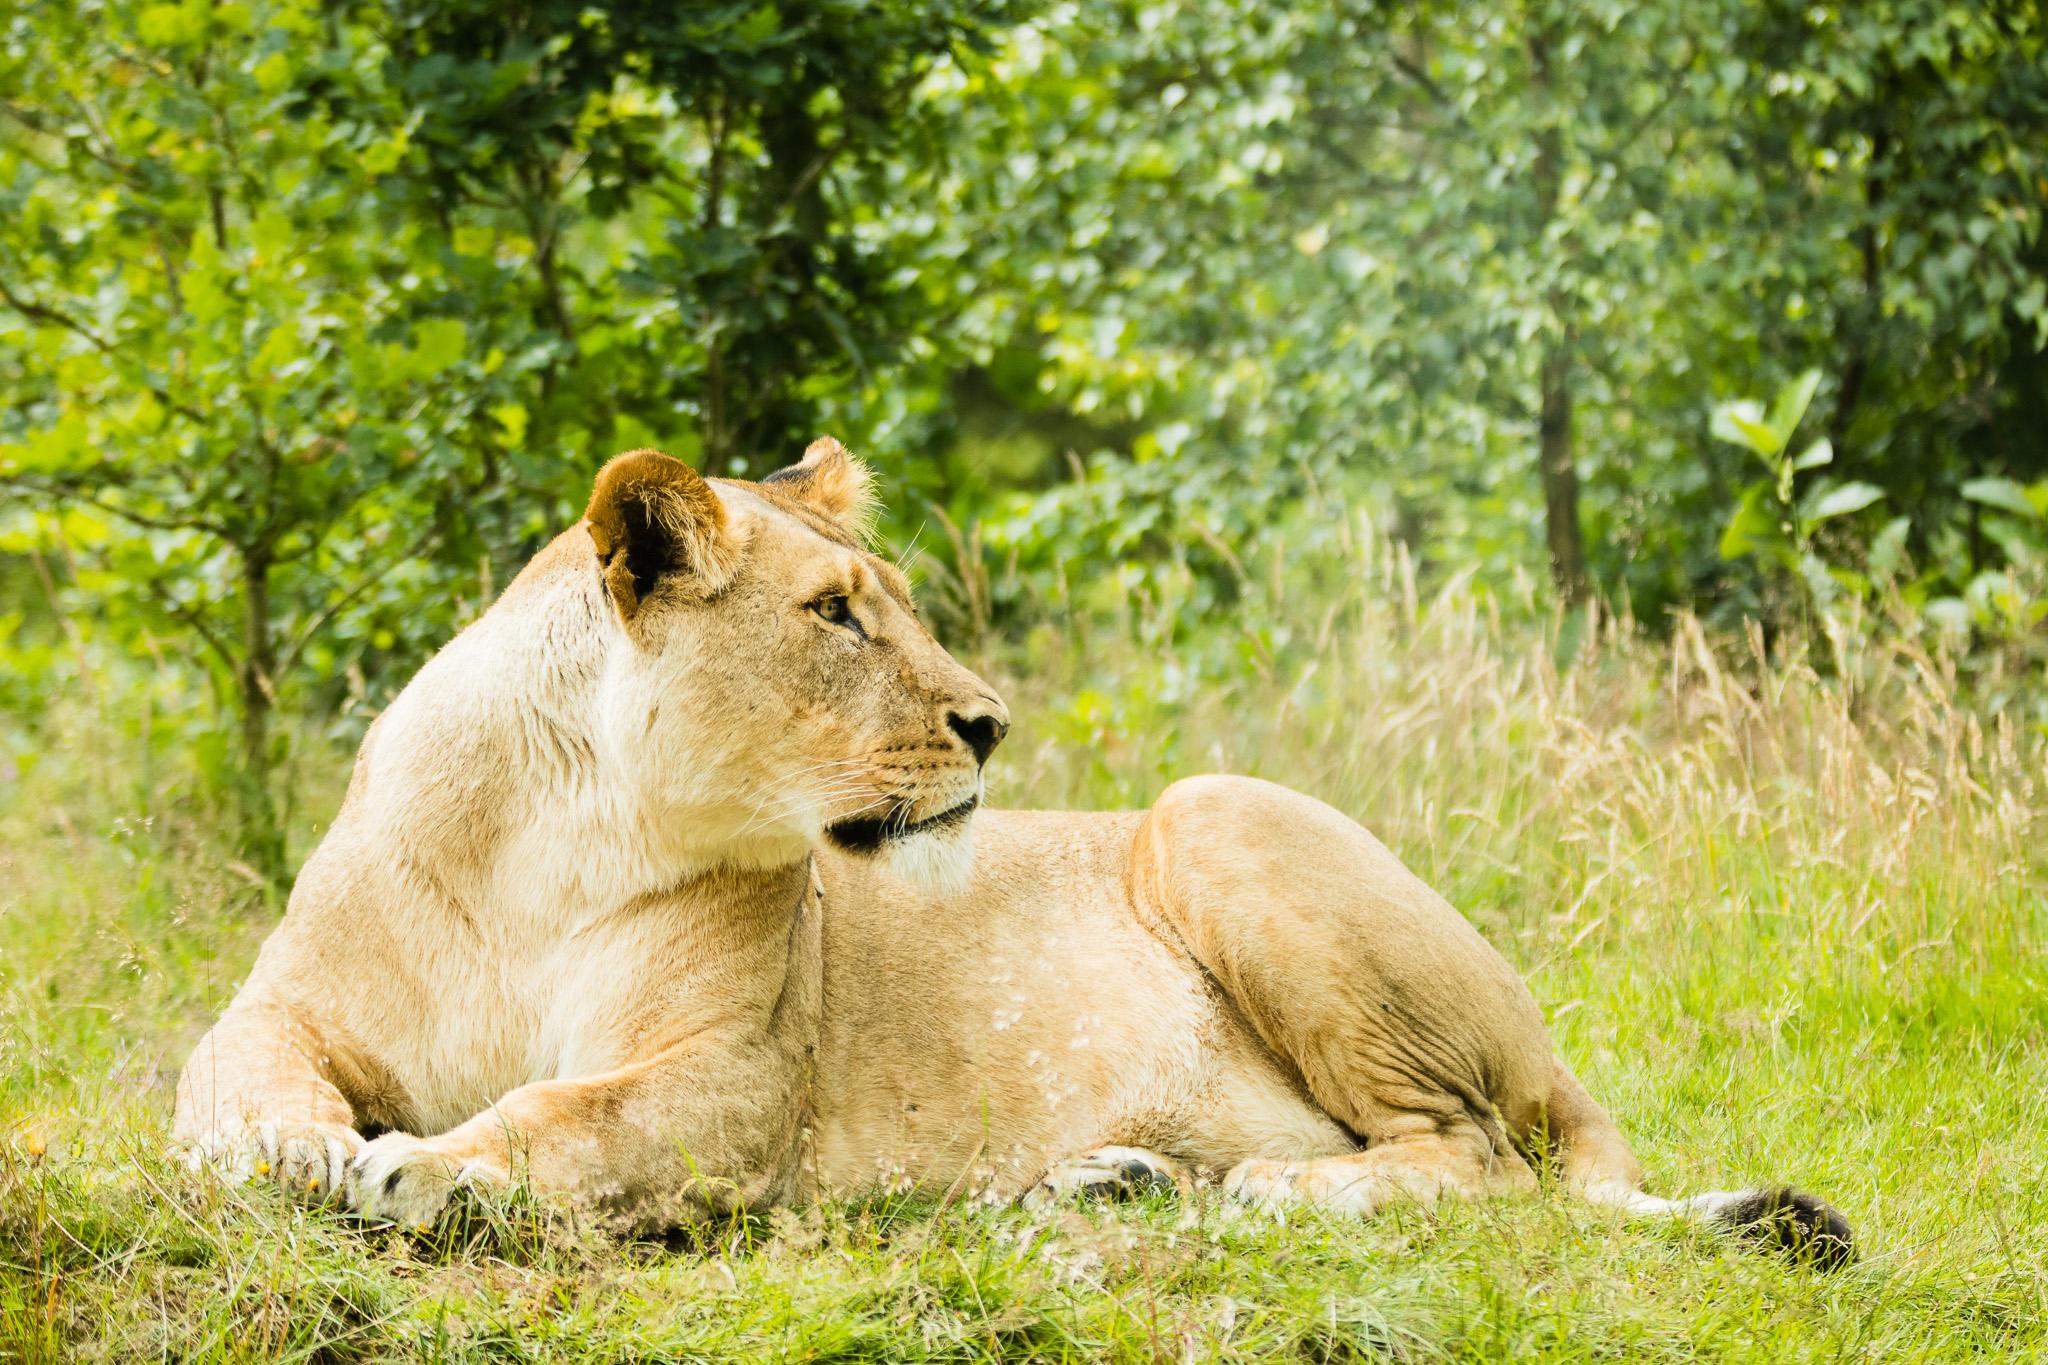 Givskud-Zoo-Safari-NorthernWorkshops-18.jpg